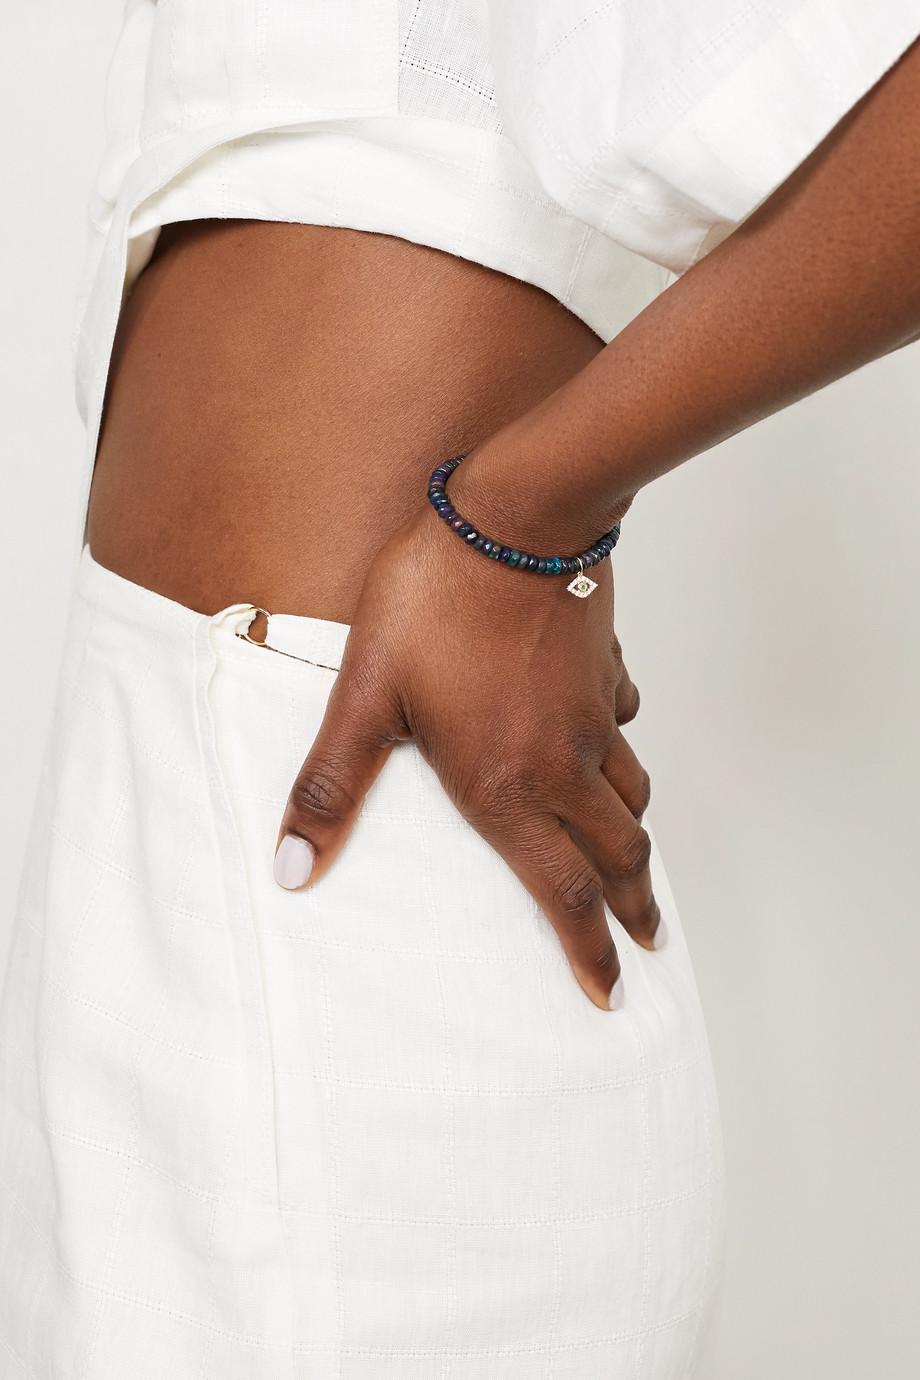 Sydney Evan Evil Eye 14-karat gold multi-stone bracelet